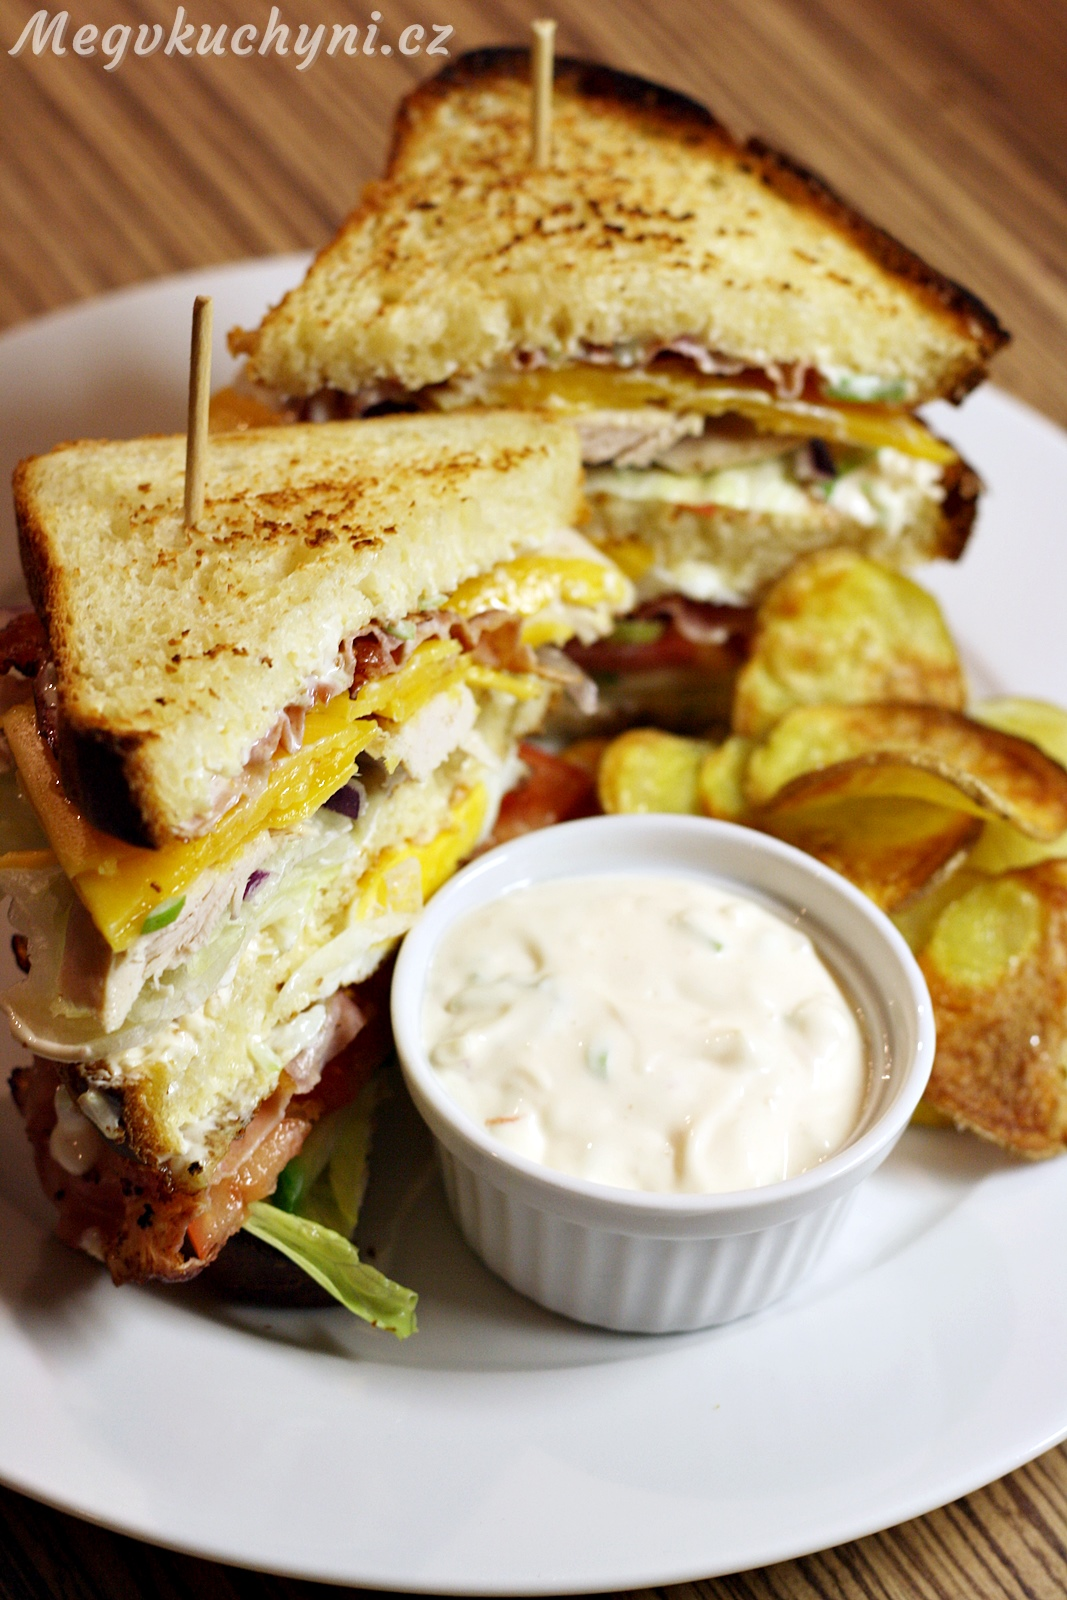 Club sandwich (atoastový chléb kněmu)